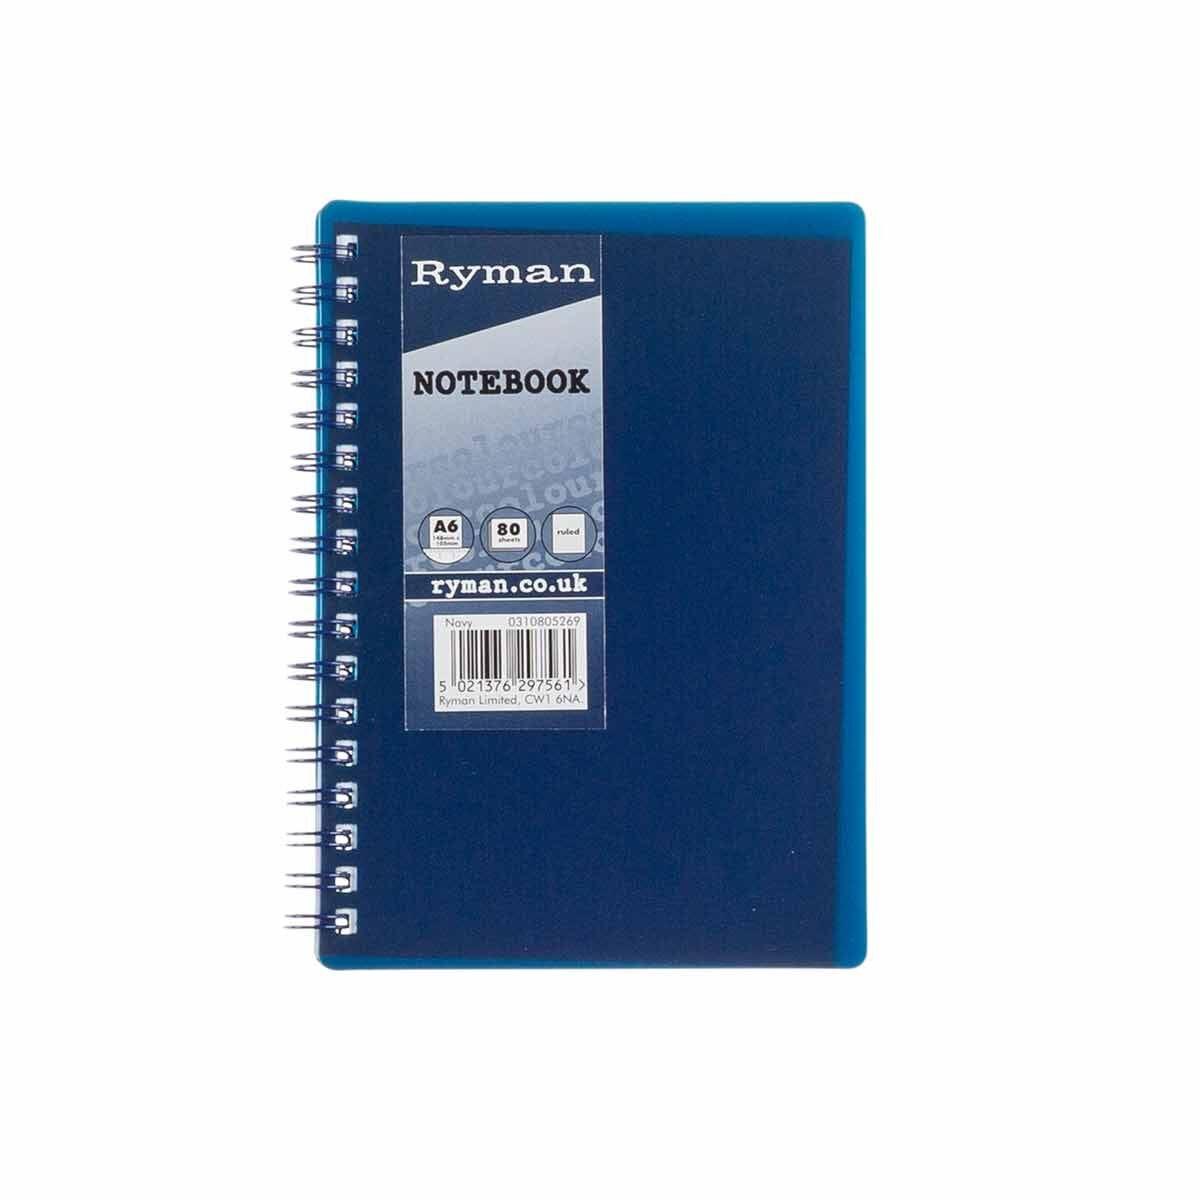 Ryman Pastel Notebook Ruled A6 Navy